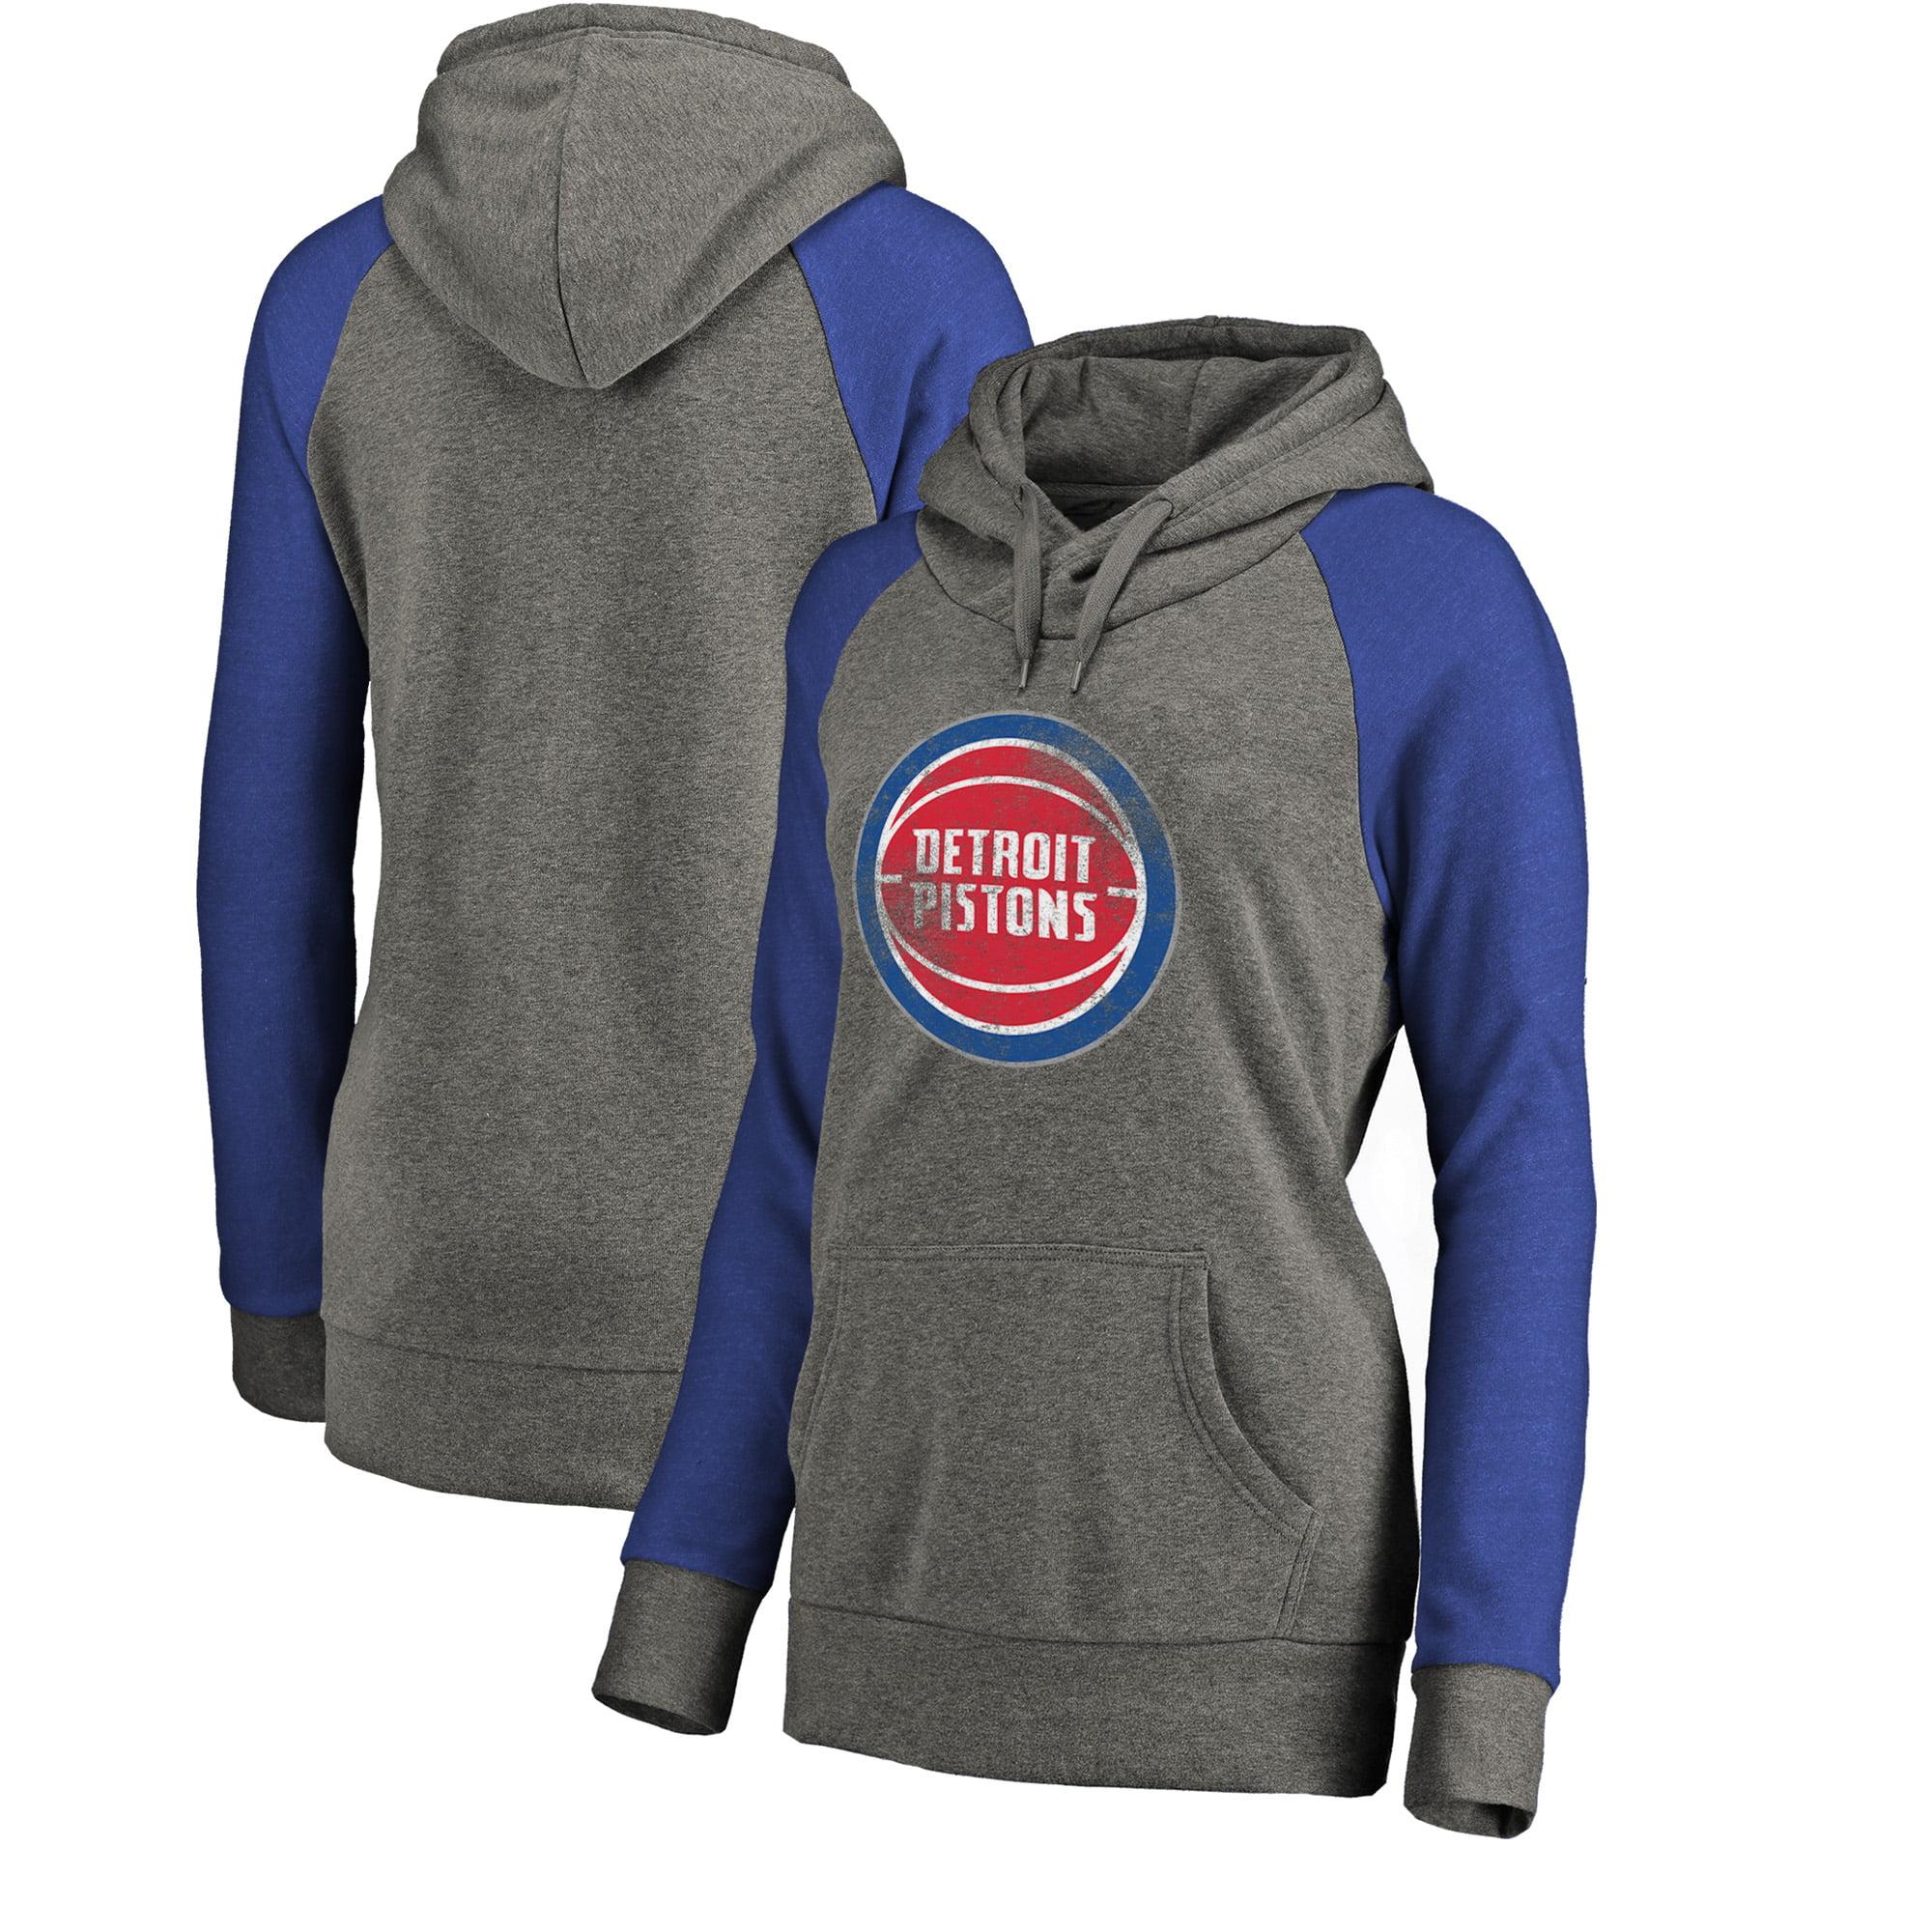 Detroit Pistons Fanatics Branded Women's Distressed Logo Tri-Blend Pullover Hoodie - Ash/Royal